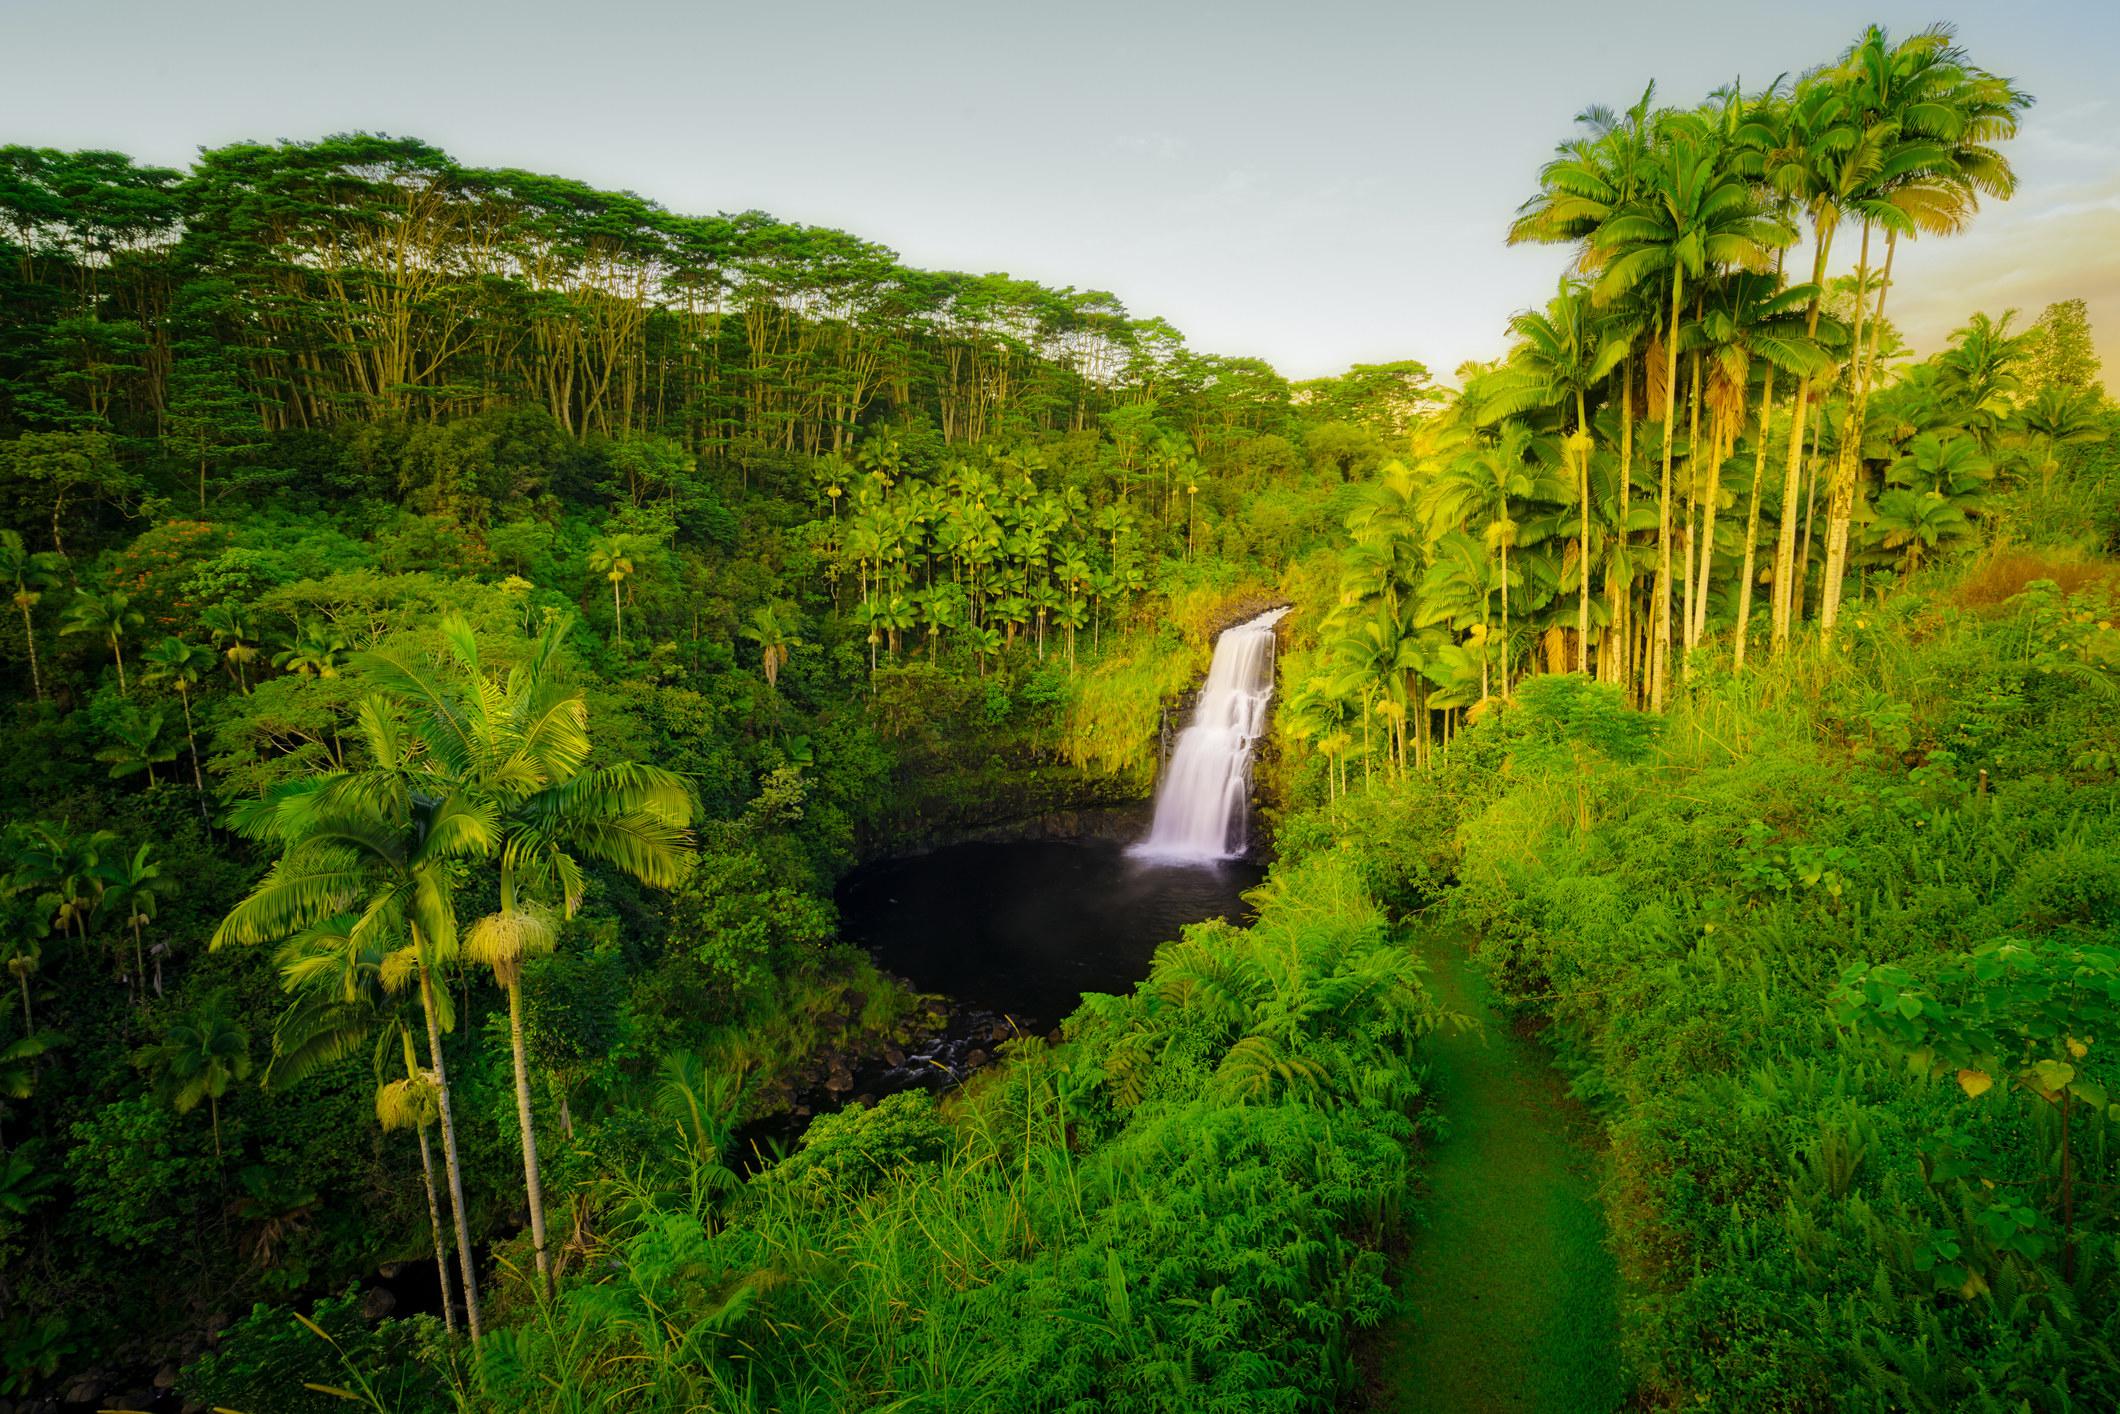 A waterfall in Hilo, Hawaii on the Big Island.